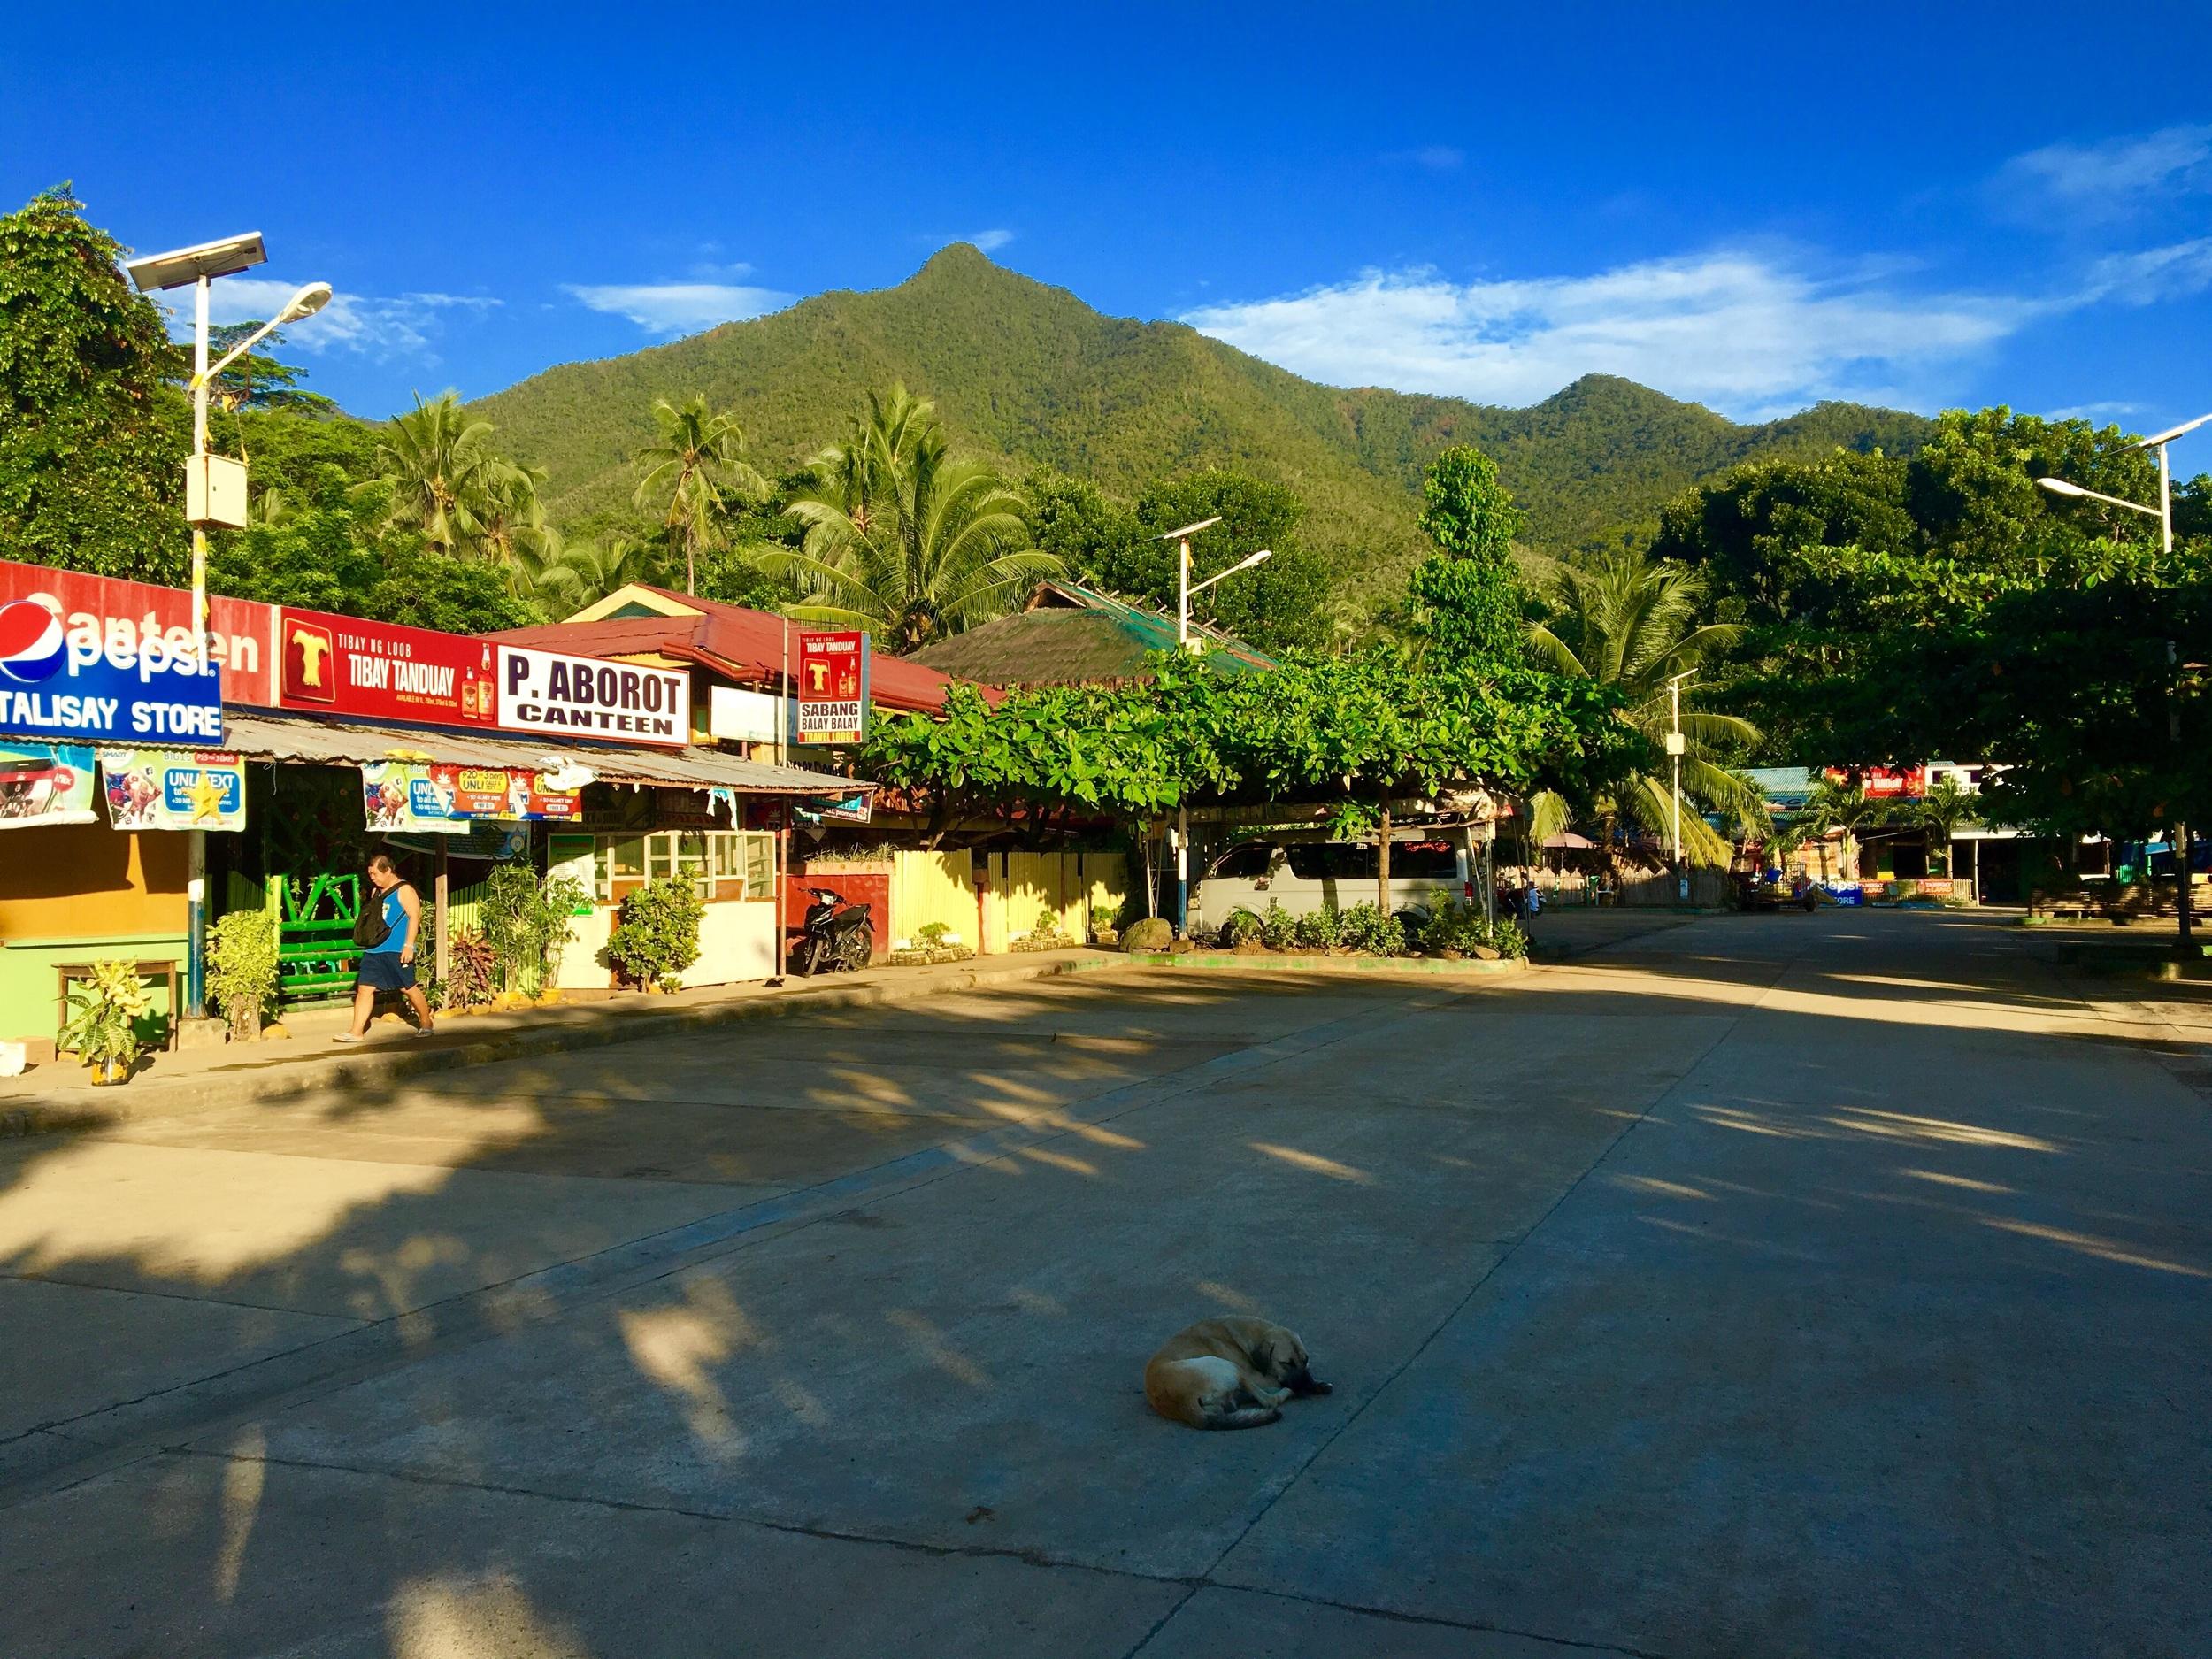 Busy Downtown Sabang